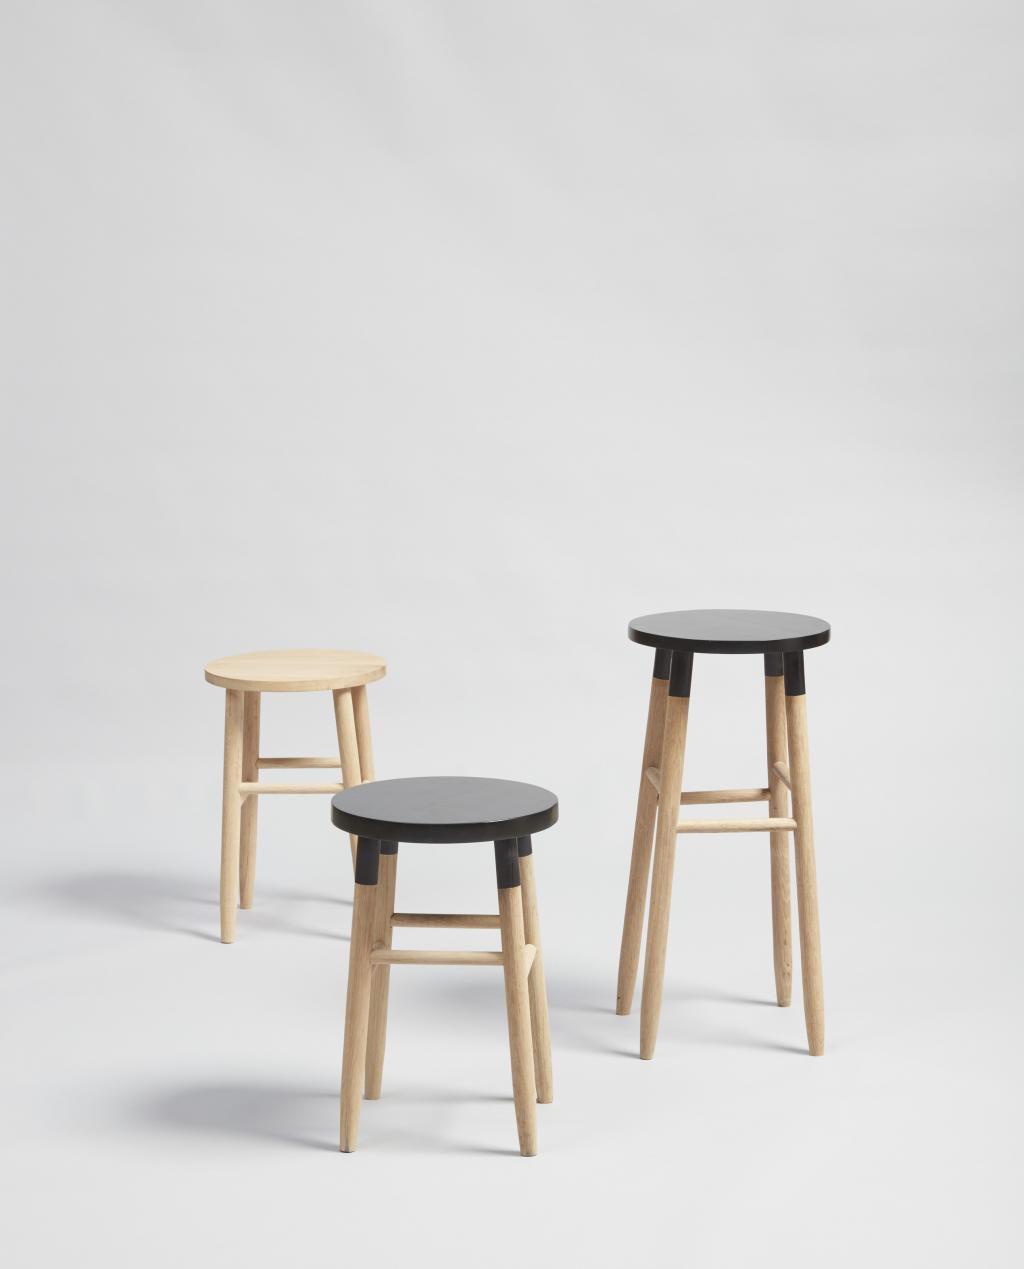 hubsch barhocker eiche natur wei 35x72 h bsch. Black Bedroom Furniture Sets. Home Design Ideas